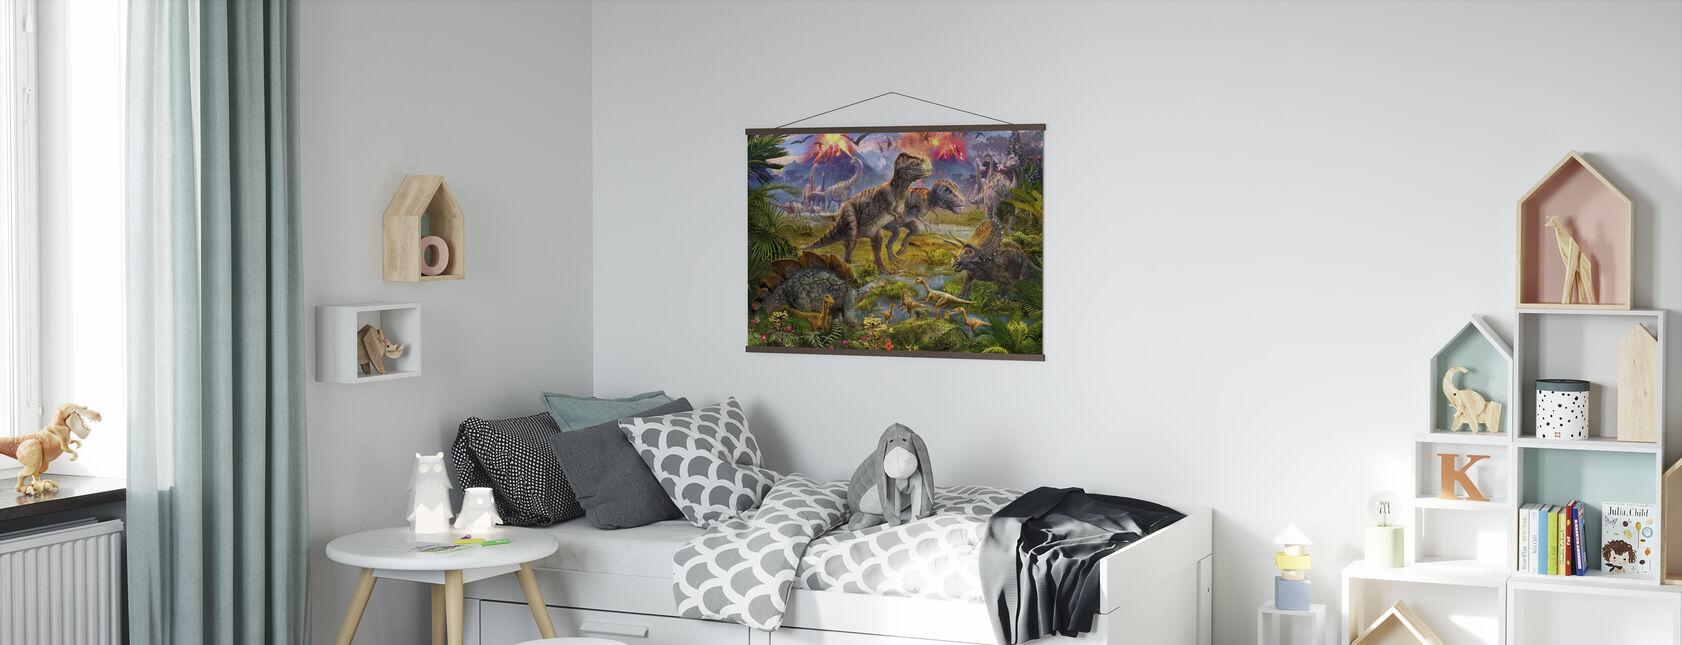 Dinosaurus verzamelen - Poster - Kinderkamer